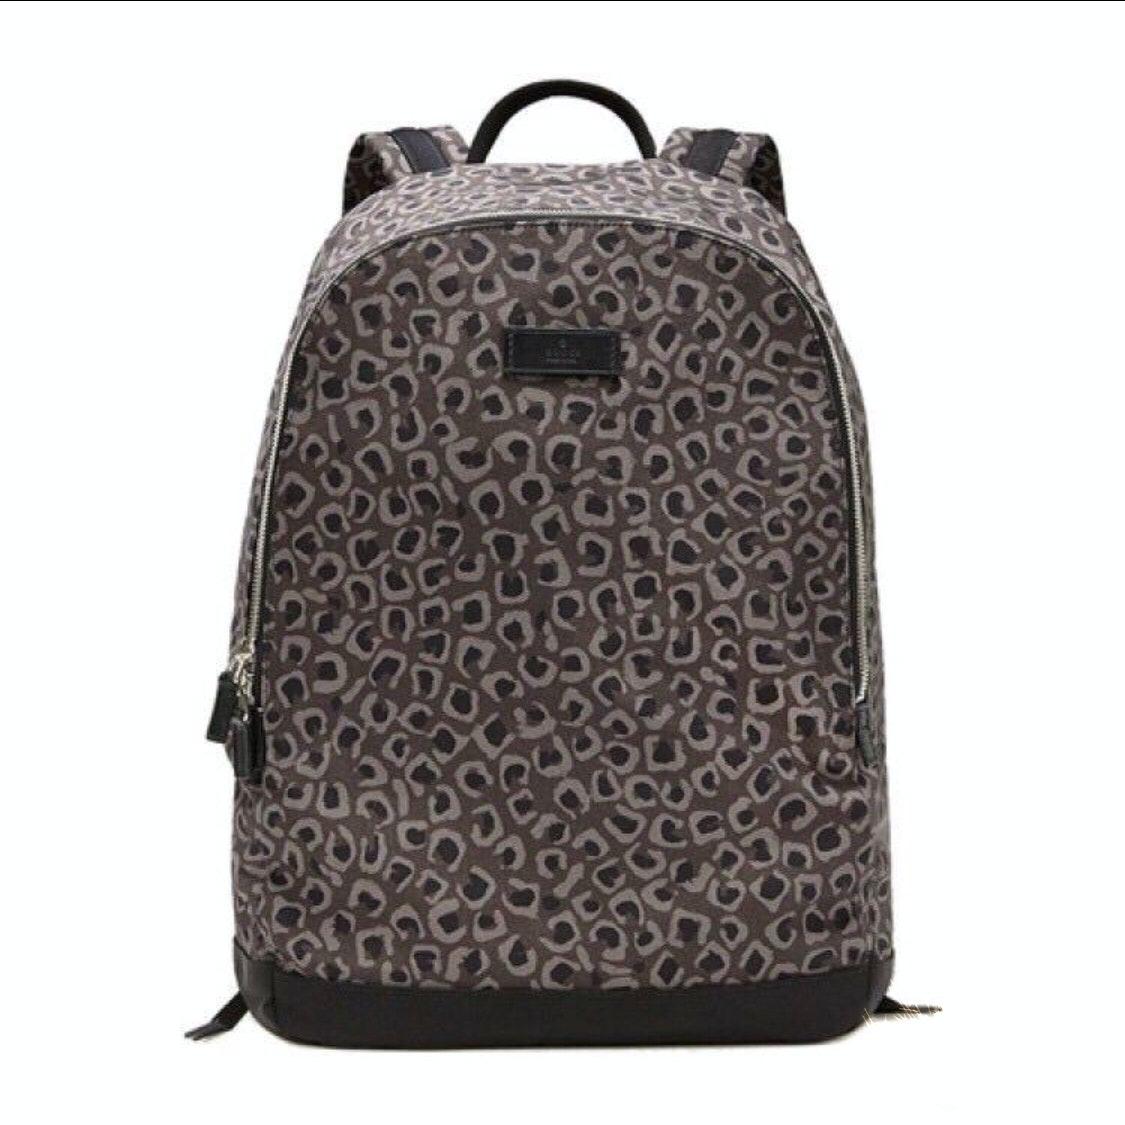 Gucci Backpack Leopard Brown/Black